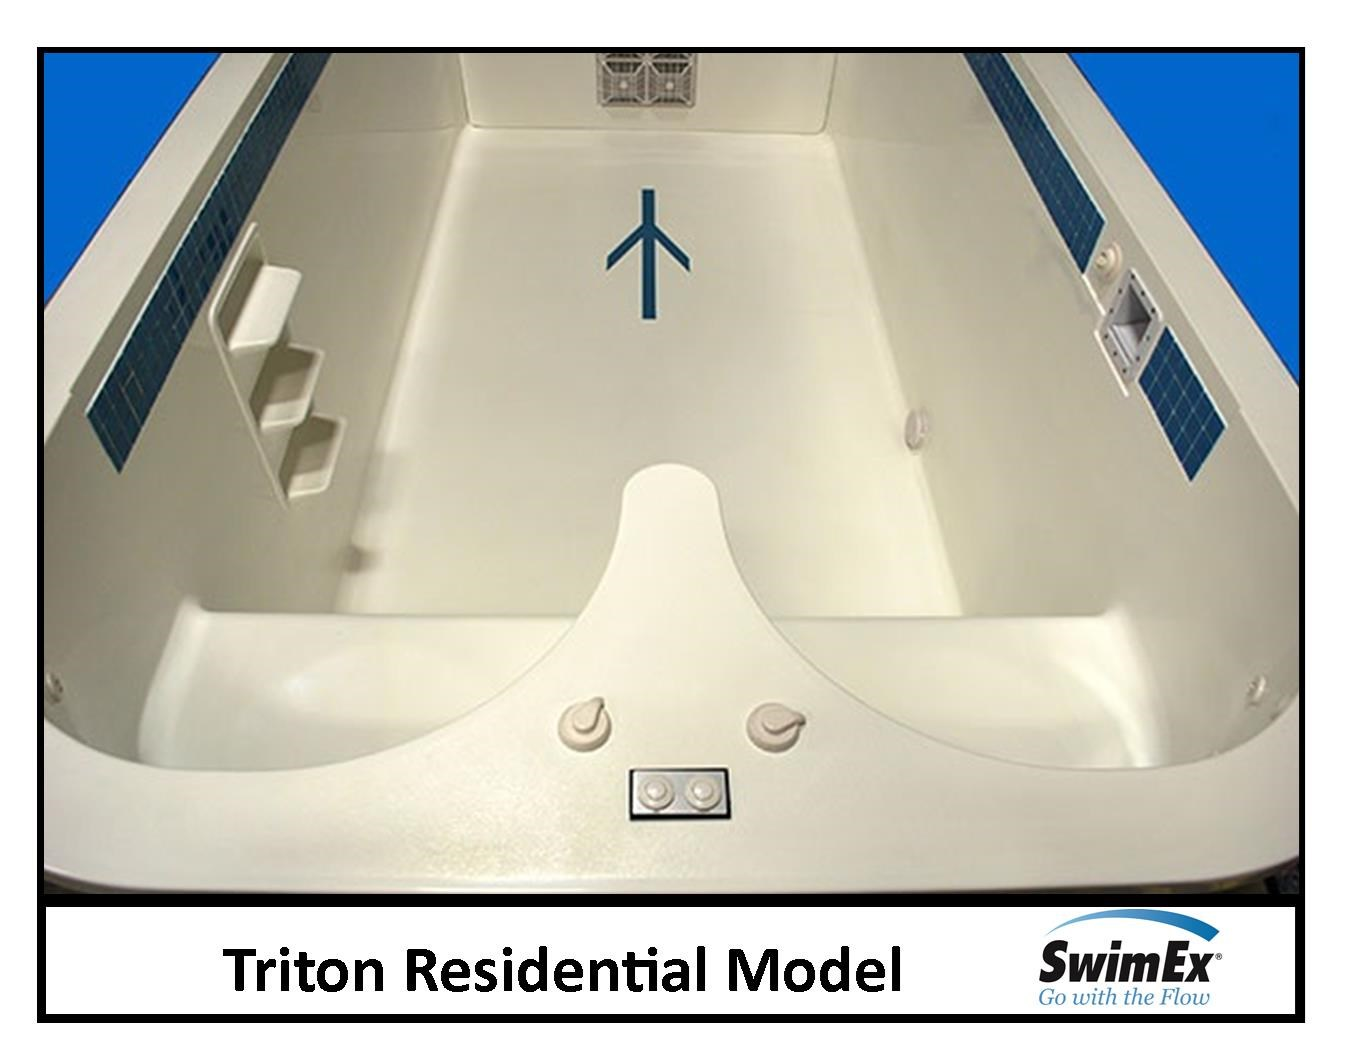 SwimEx debuts Triton Pool